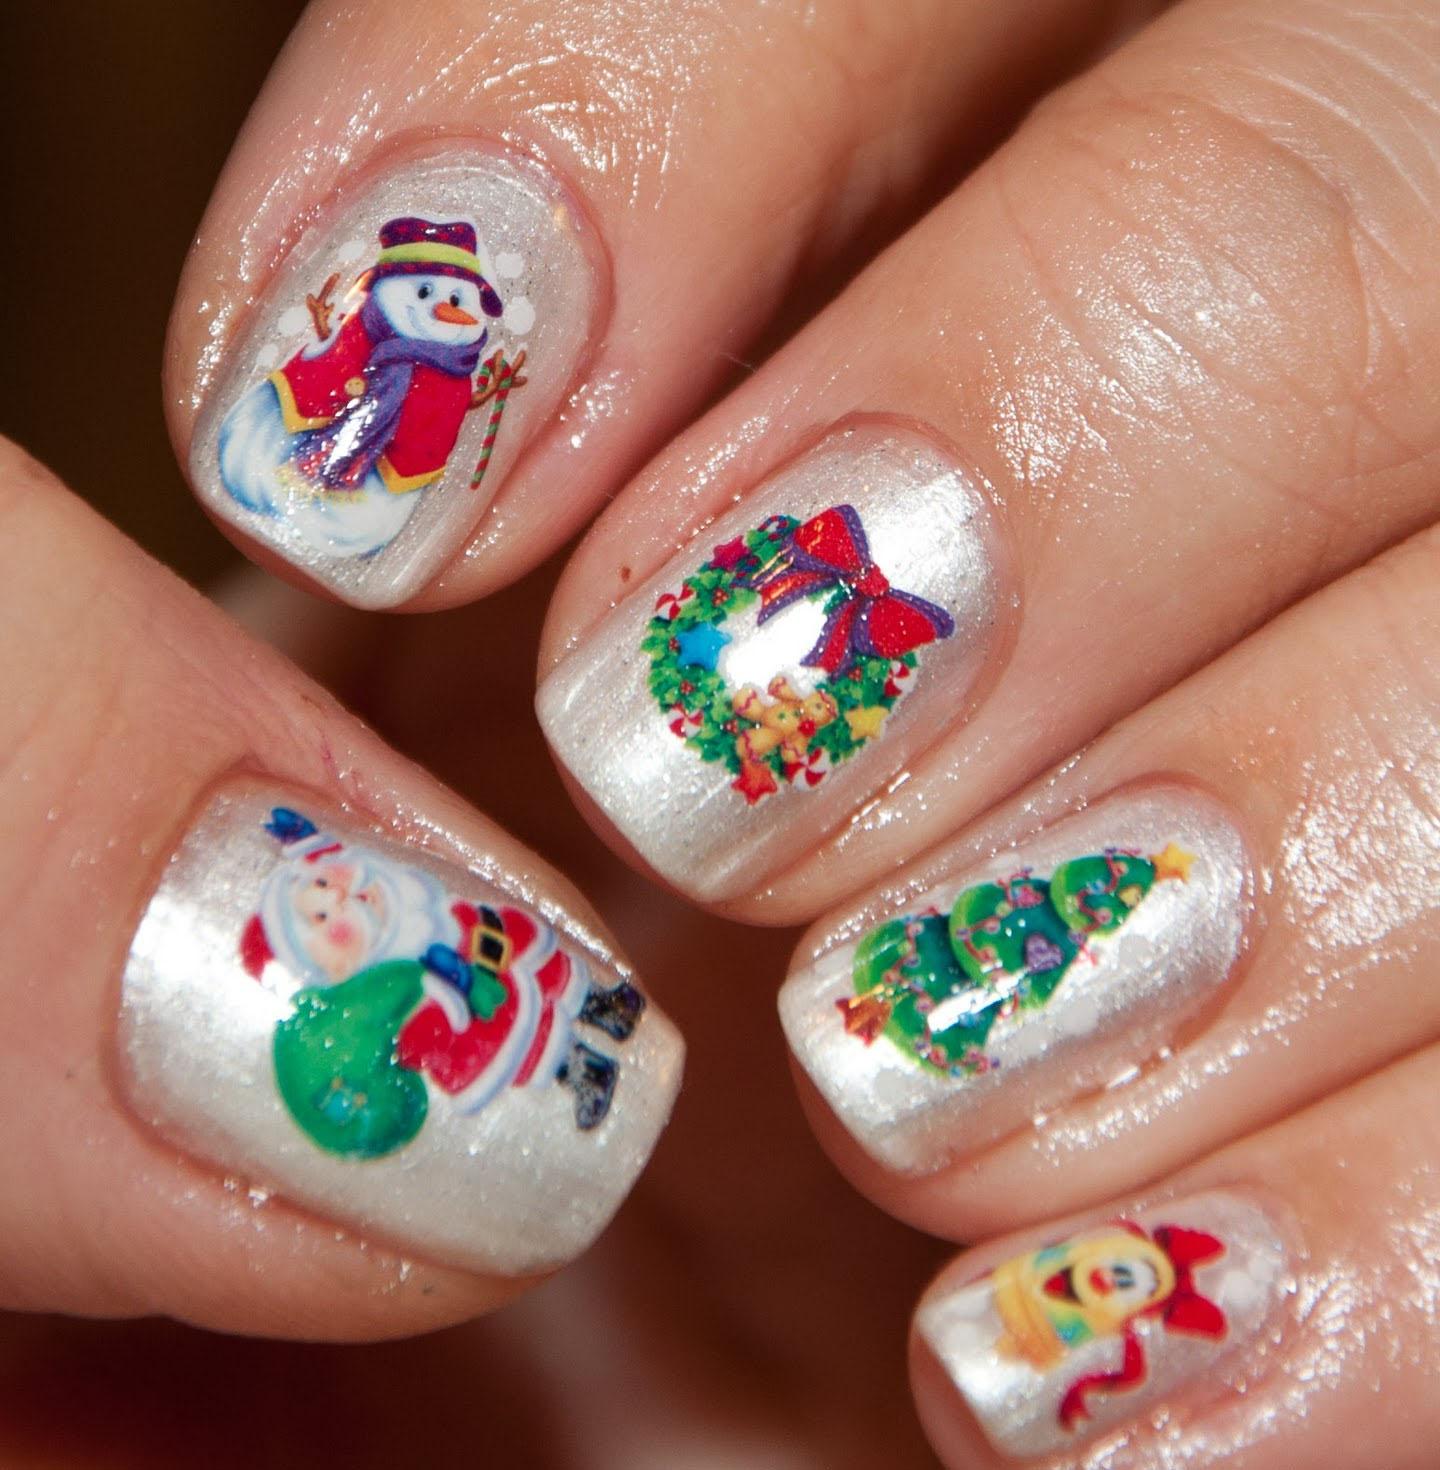 Christmas Nail Polish Design: Women Beauty Tips: 10+ Sizzling Christmas Nail Polish Ideas